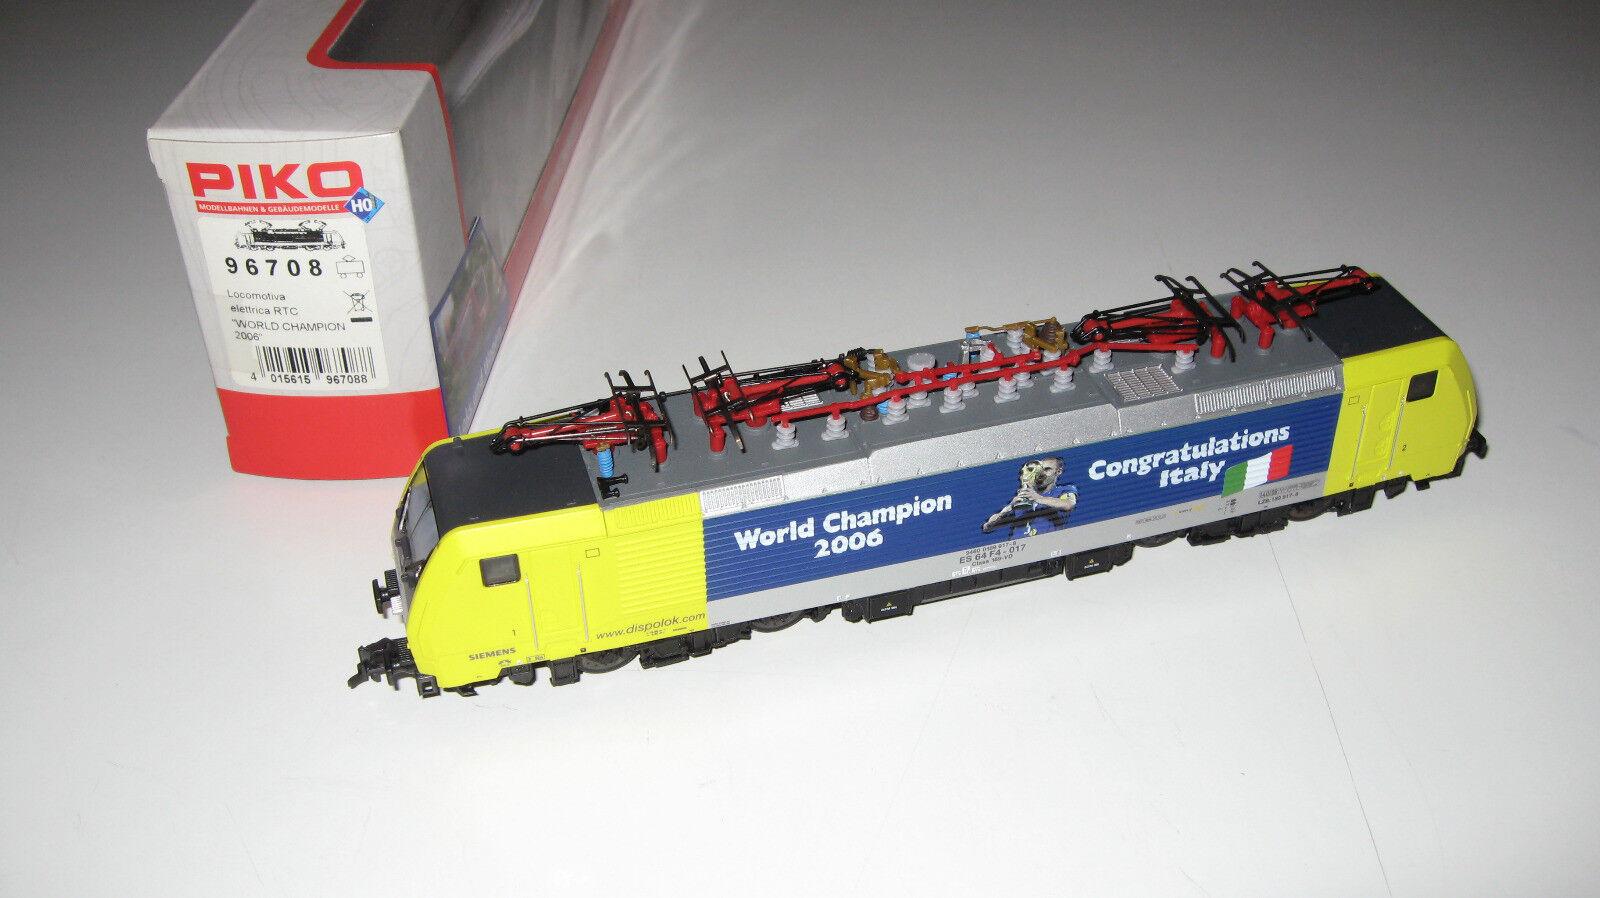 PIKO 96708 - Rail Traction Company  RTC locomotore elettrico ES 64 F4 - 017 - H0